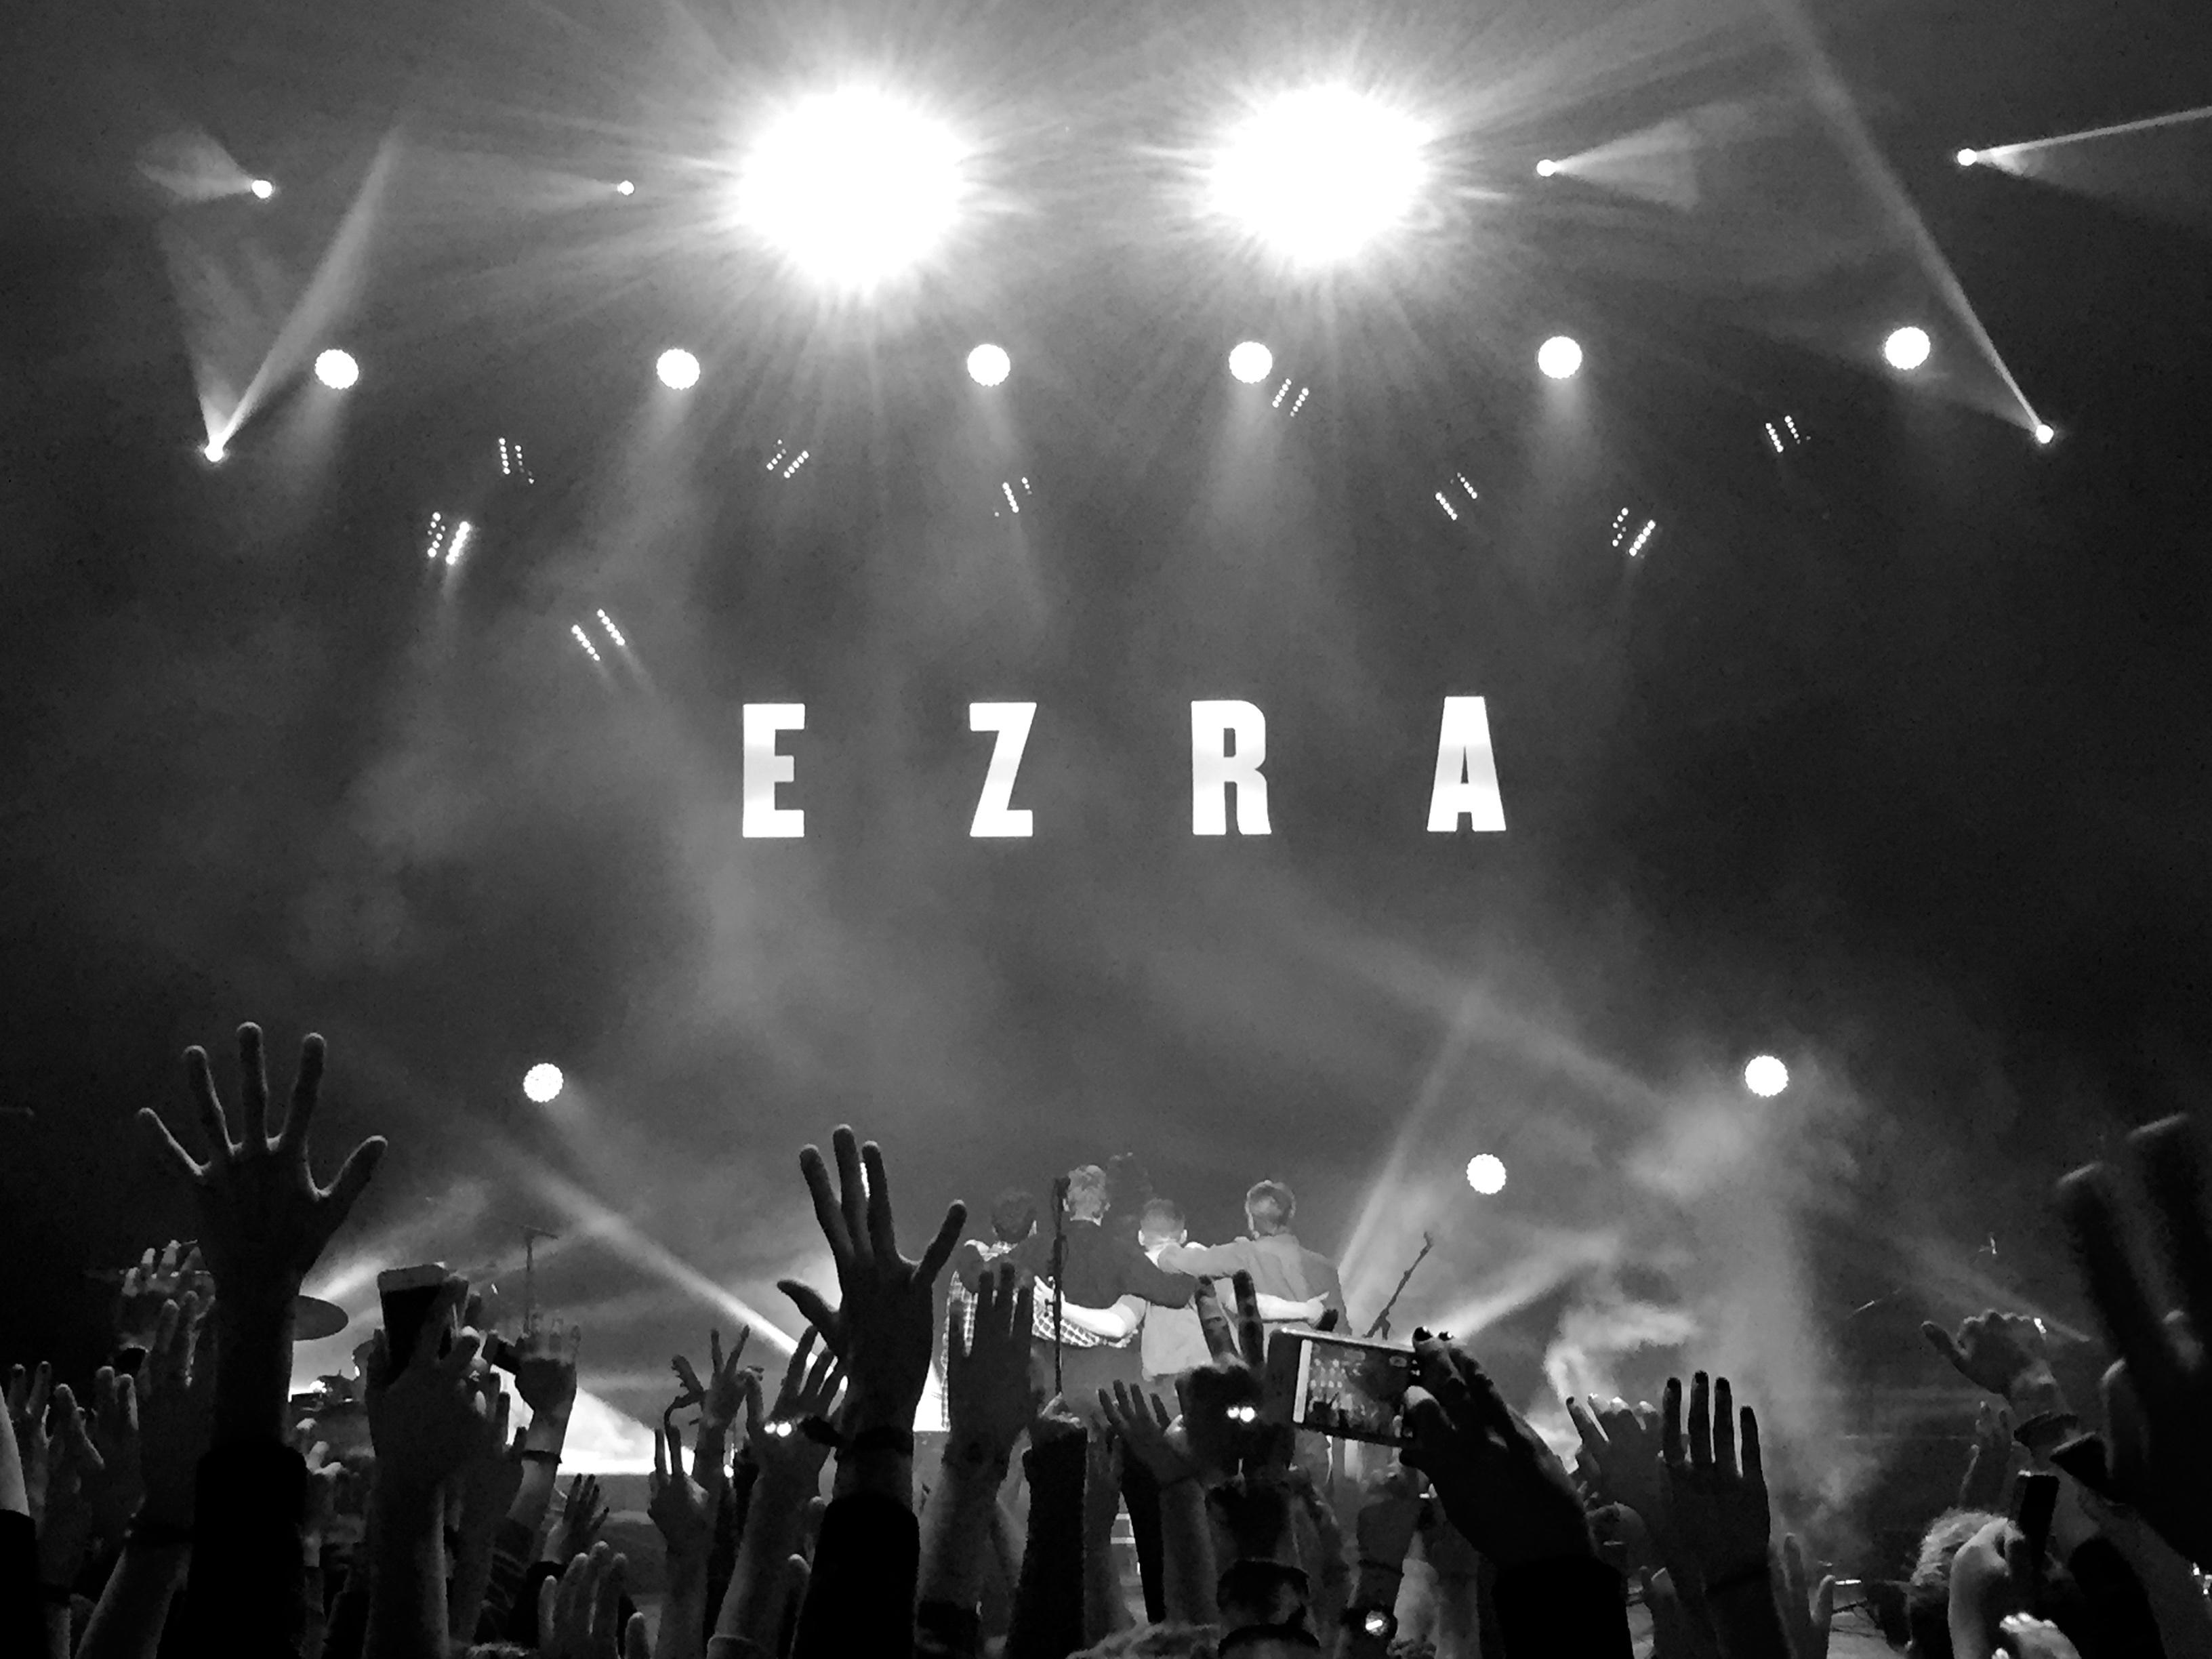 George Ezra Feb 7